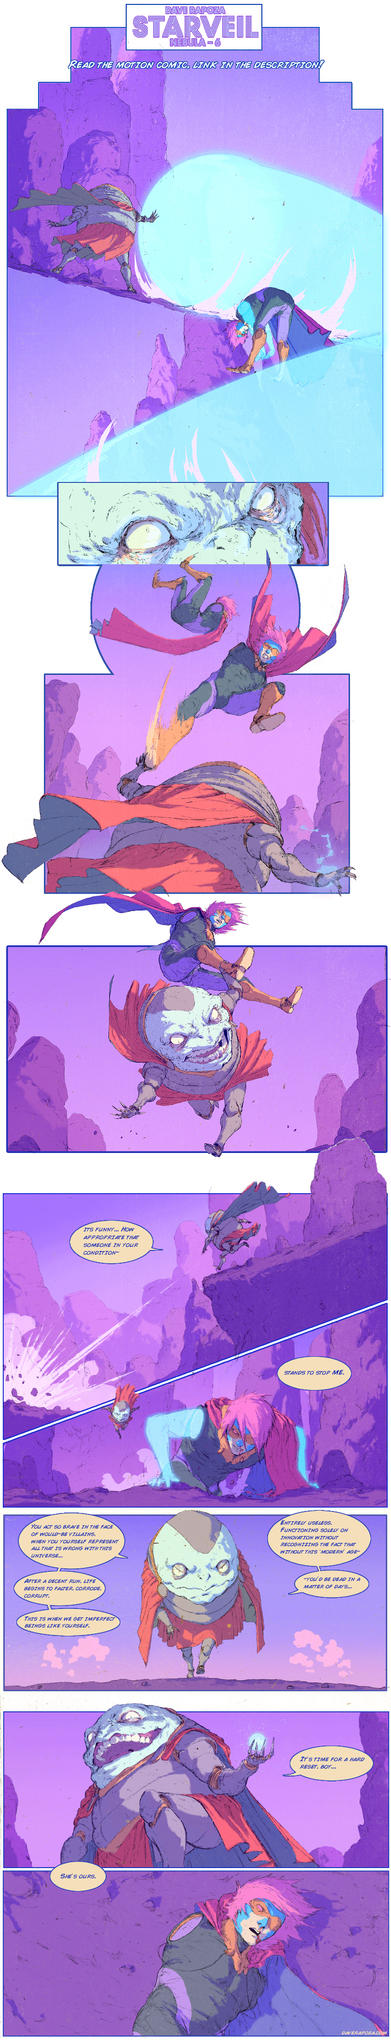 StarVeil - Nebula #6 (motion comic in description) by DavidRapozaArt